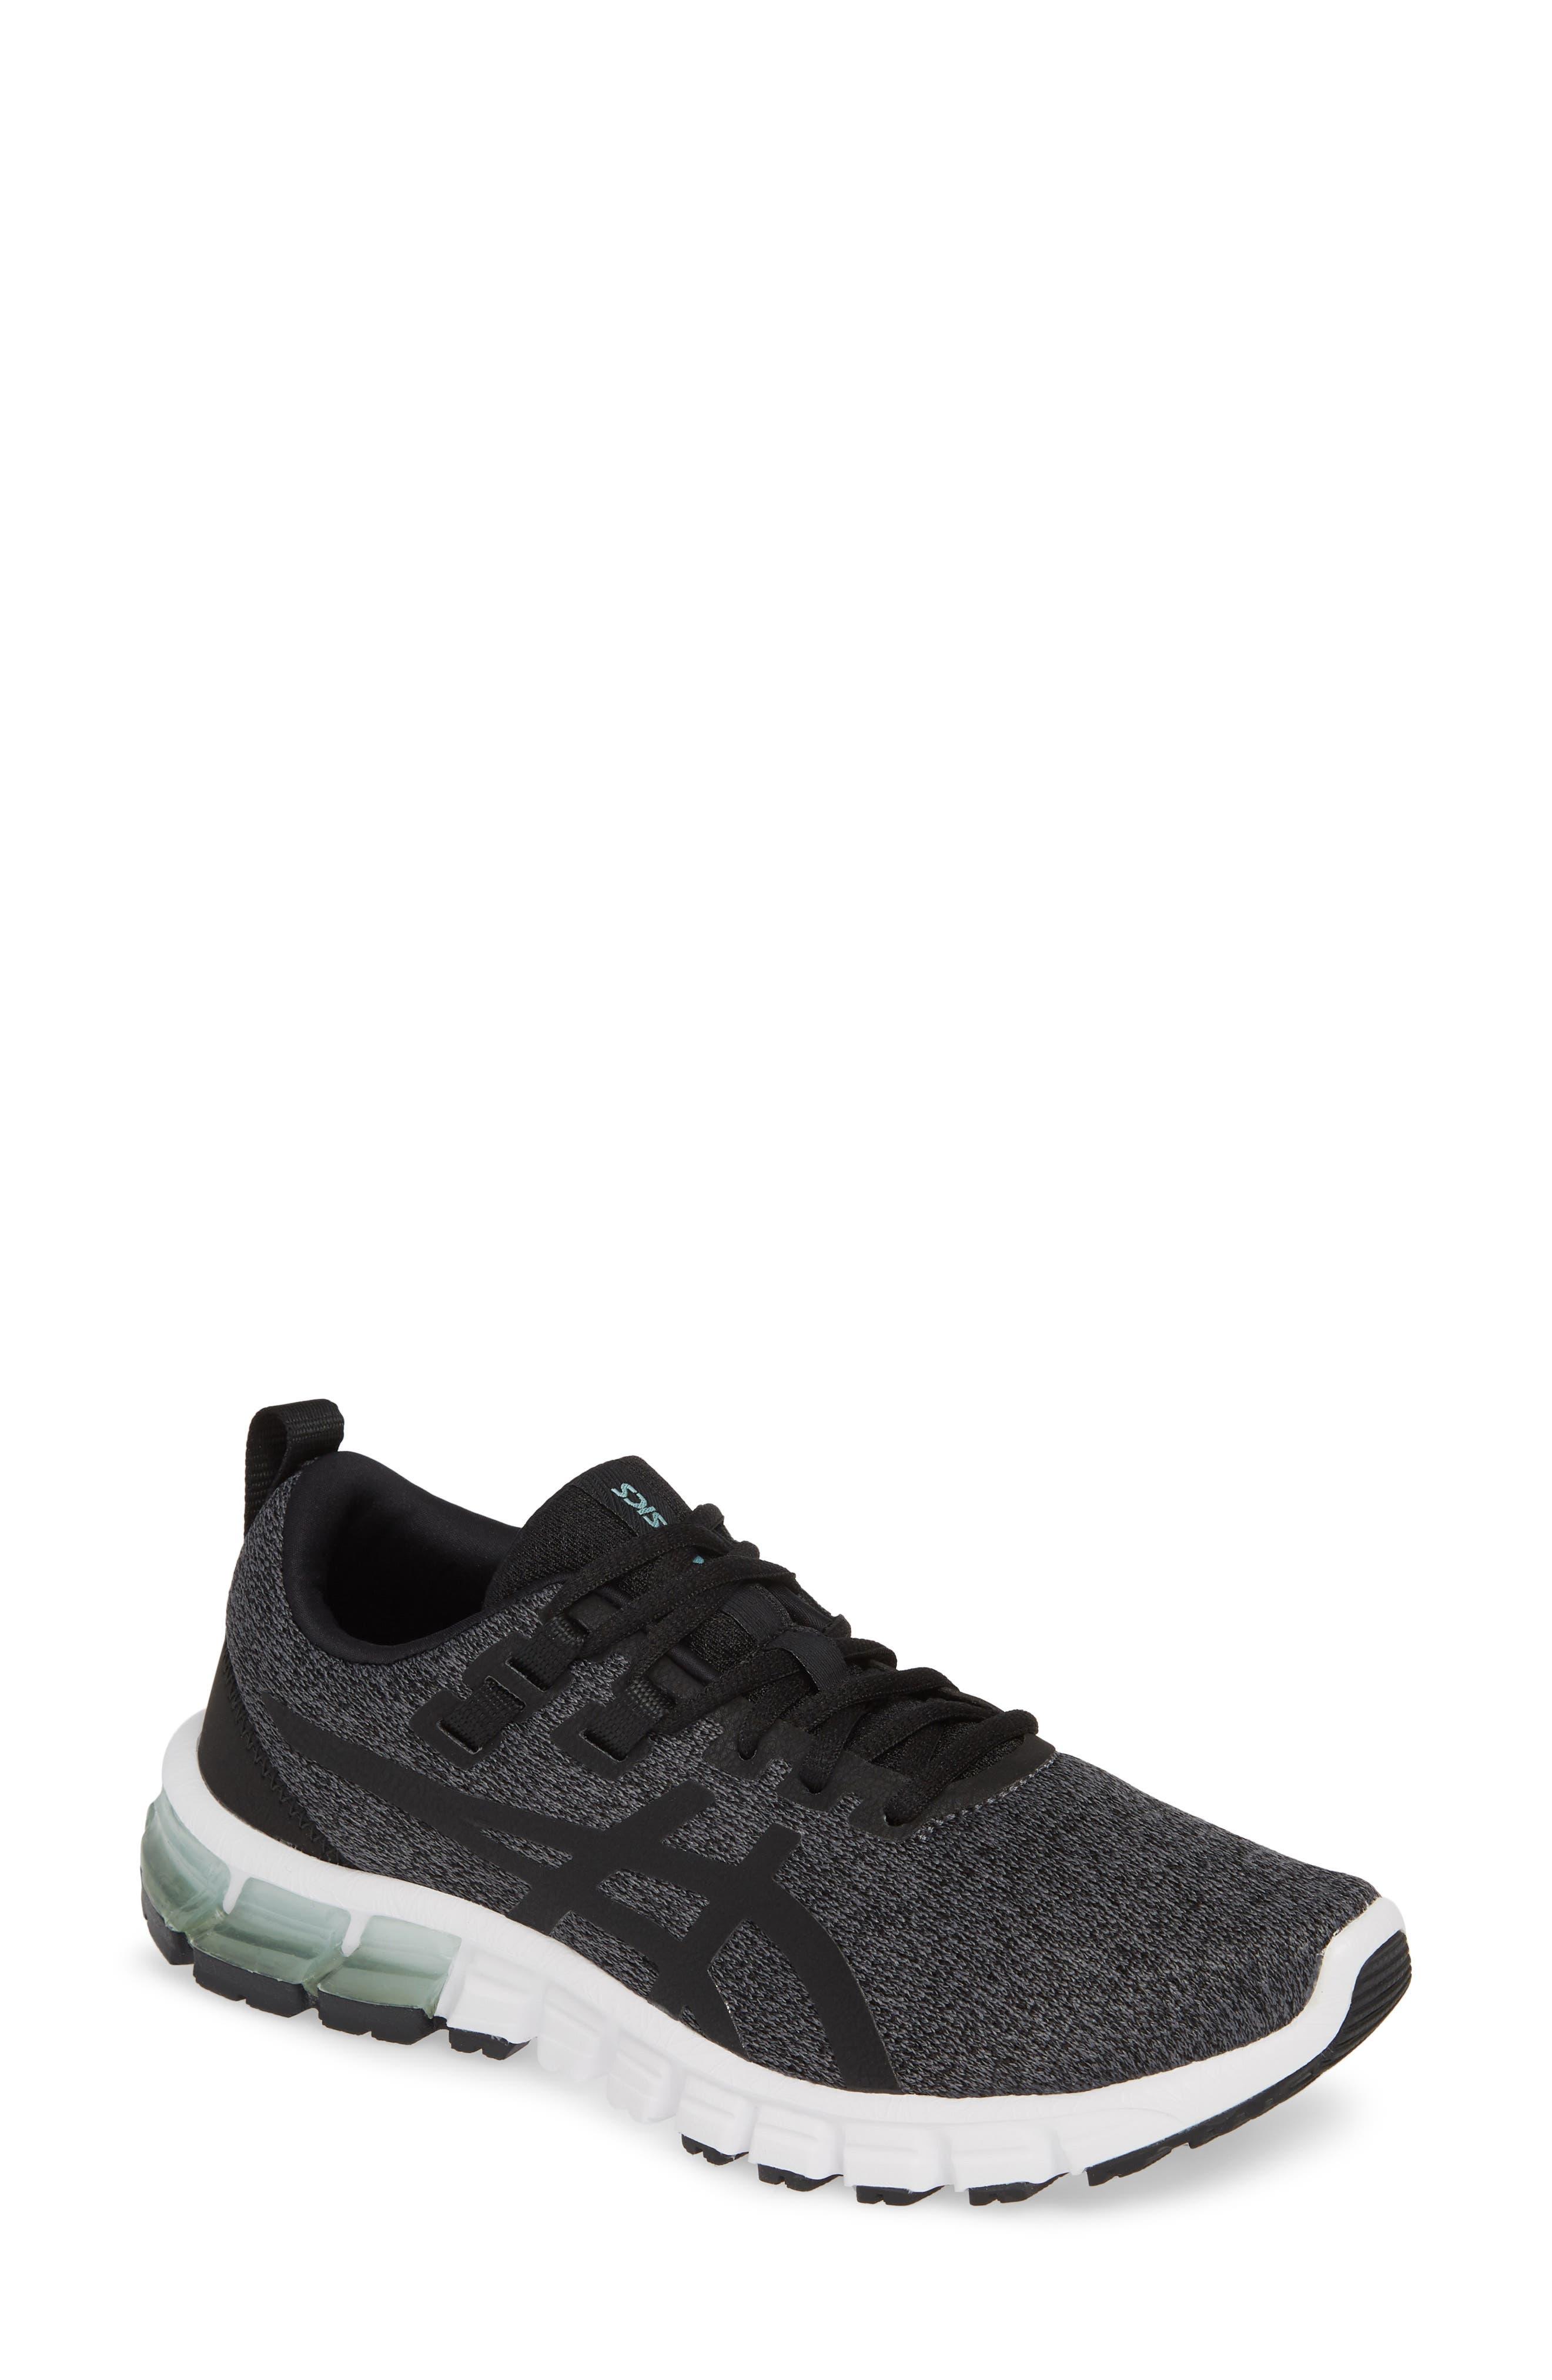 ASICS<SUP>®</SUP> GEL<sup>®</sup> Quantum 90 Running Shoe, Main, color, 001